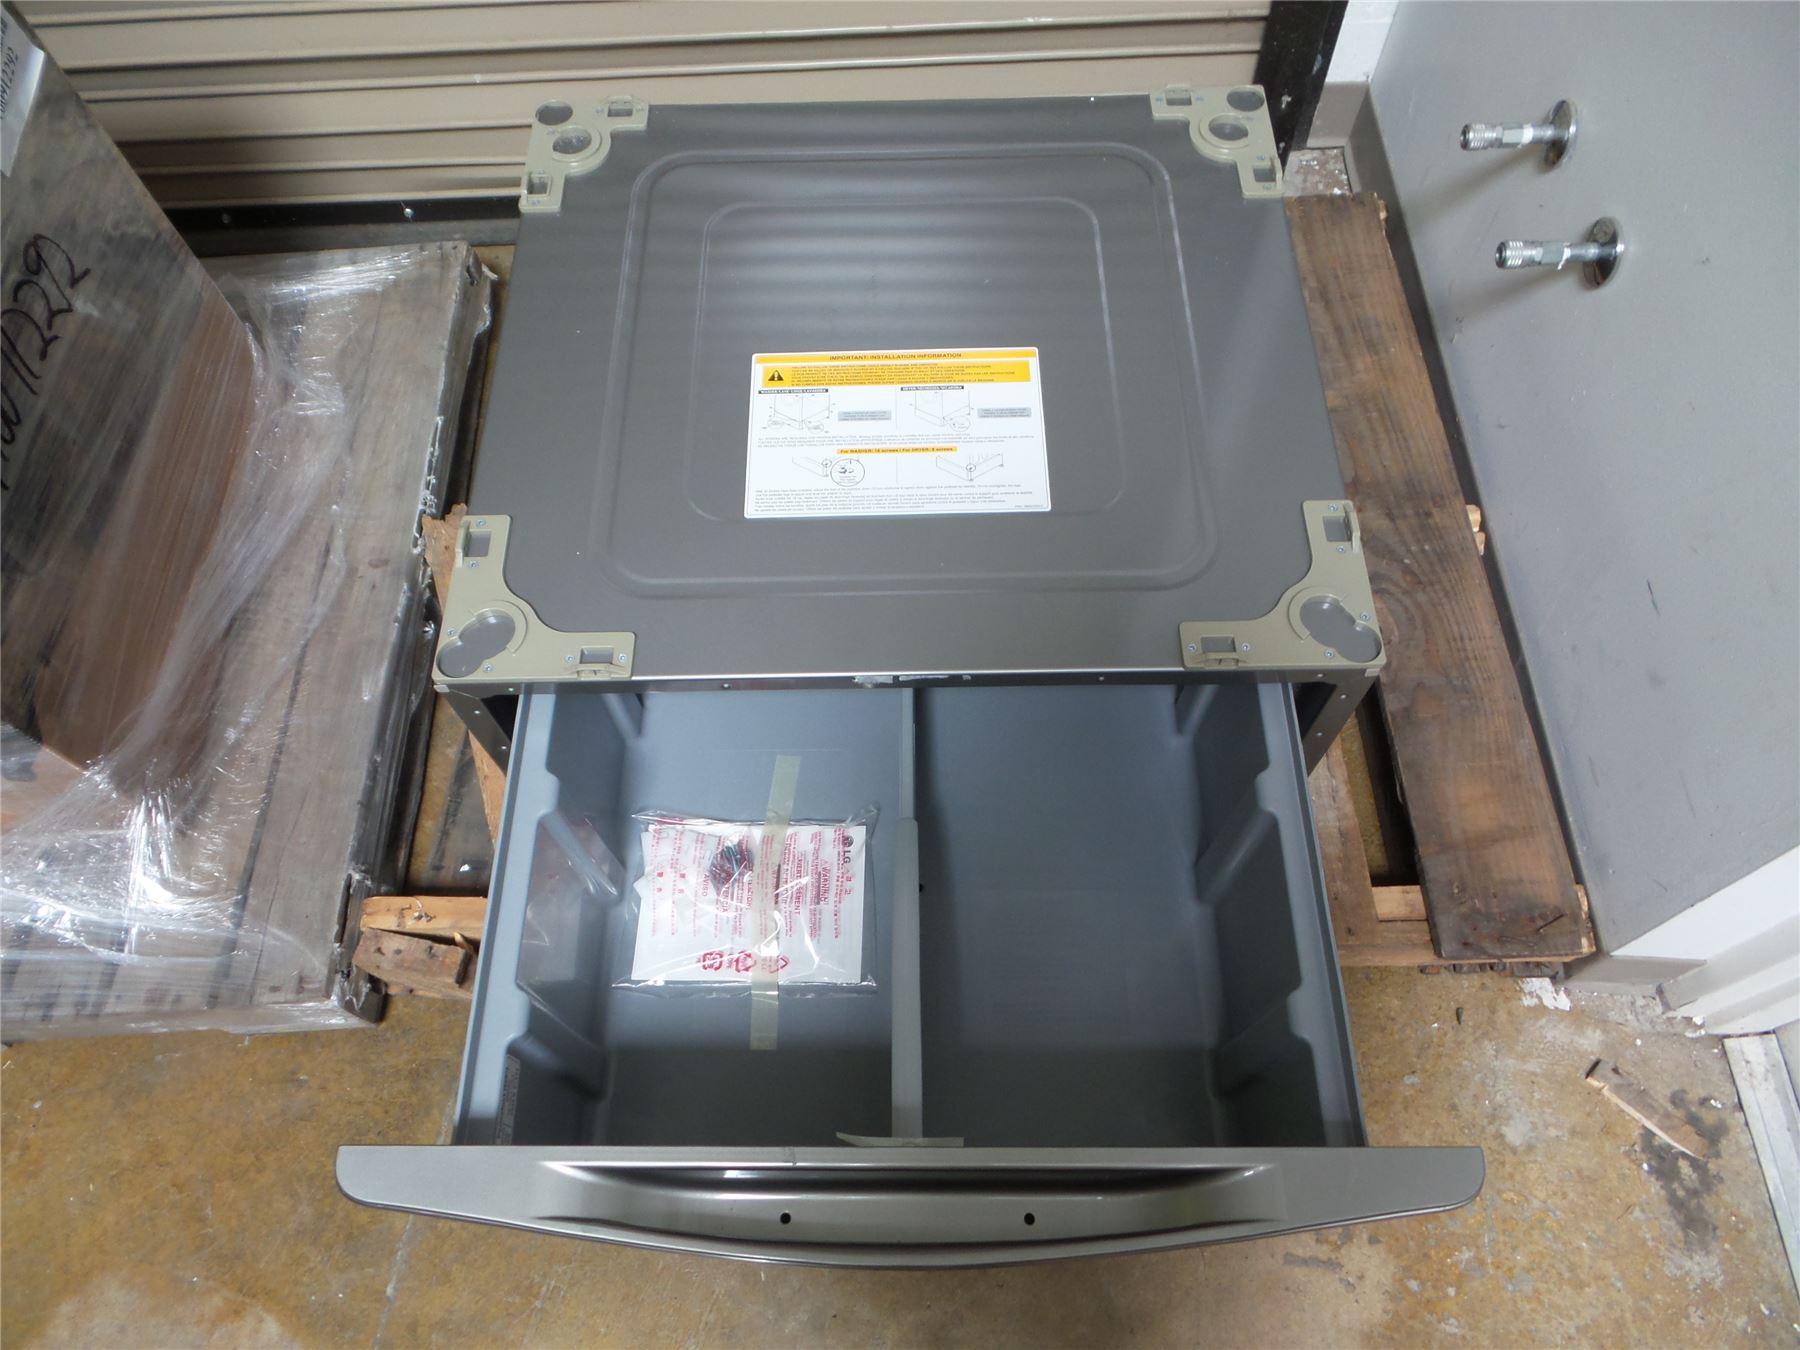 Lg Washer Dryer 29 Laundry Pedestal W Storage Drawer